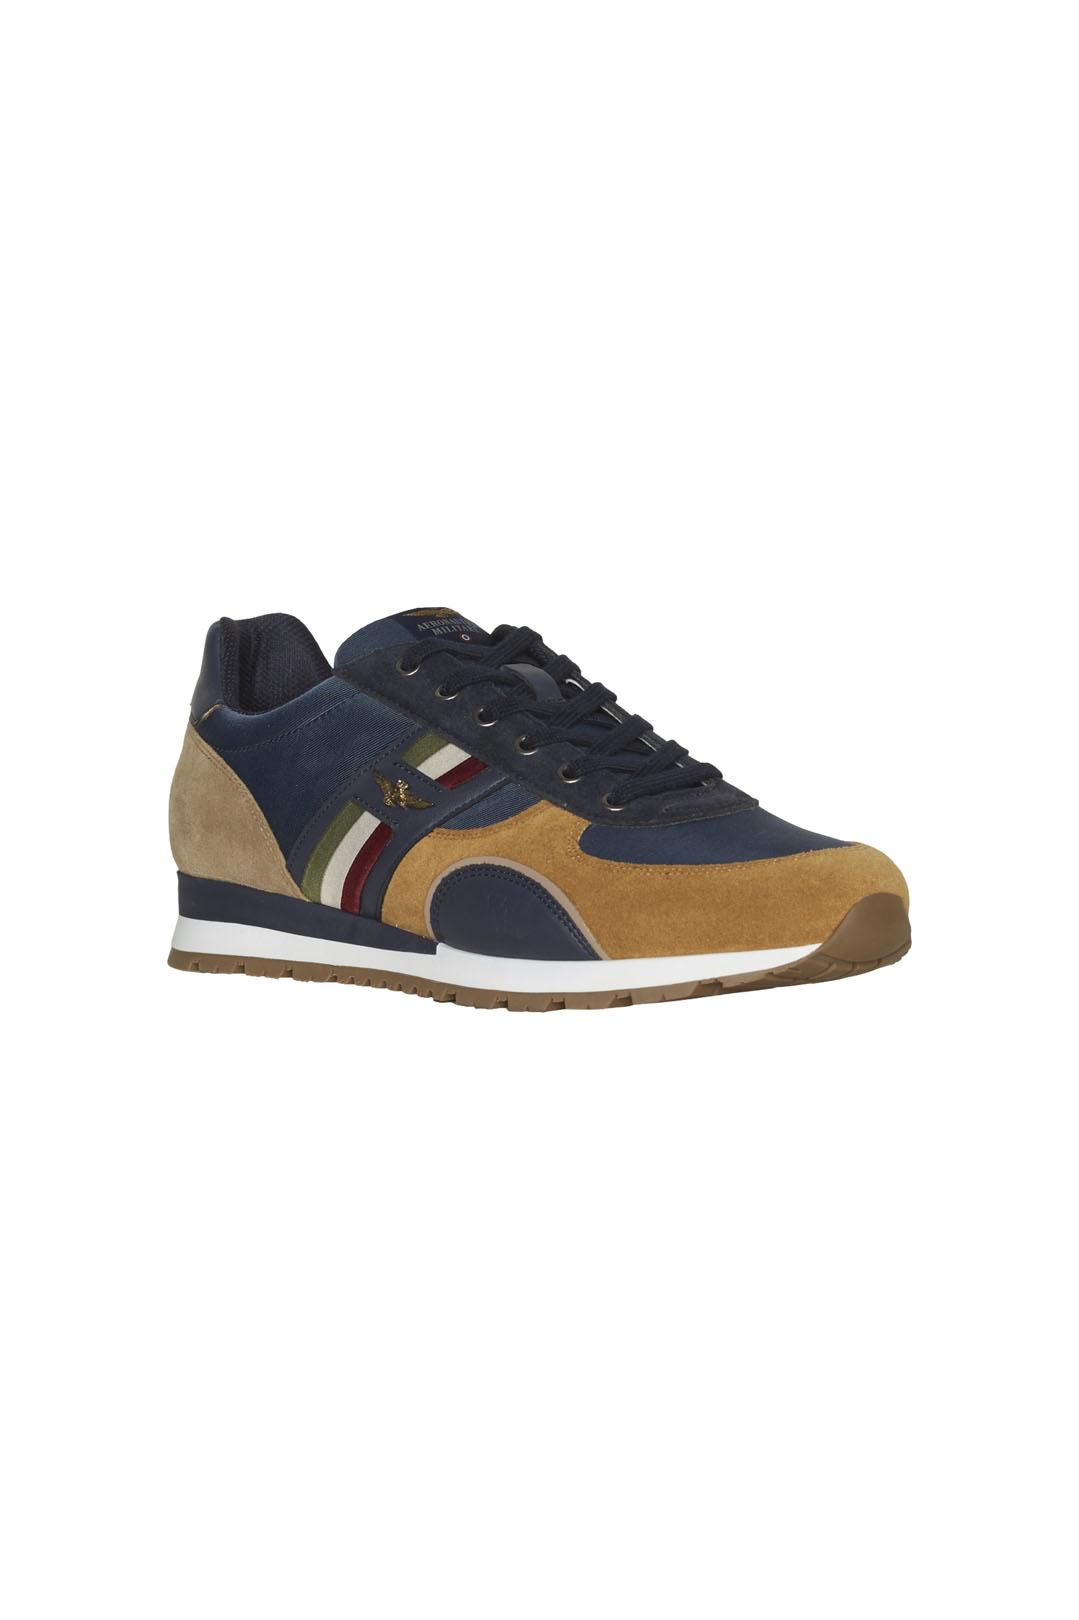 Sneakers avec tricolore                  1